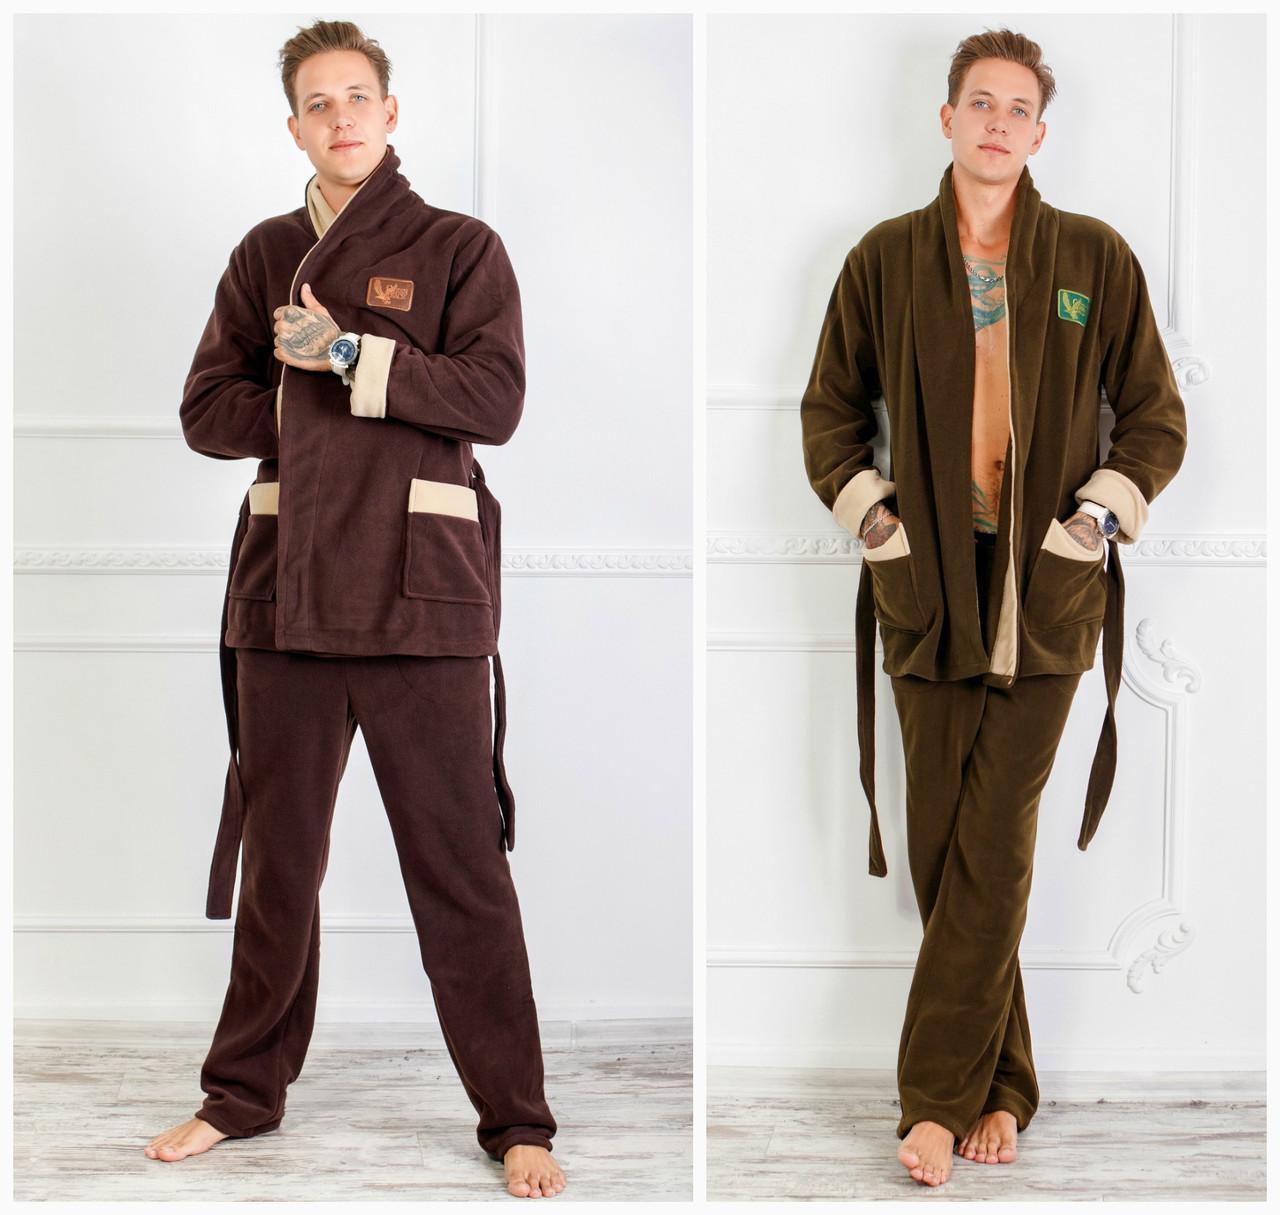 ea95c4819e5 Домашний теплый мужской костюм 17495  продажа